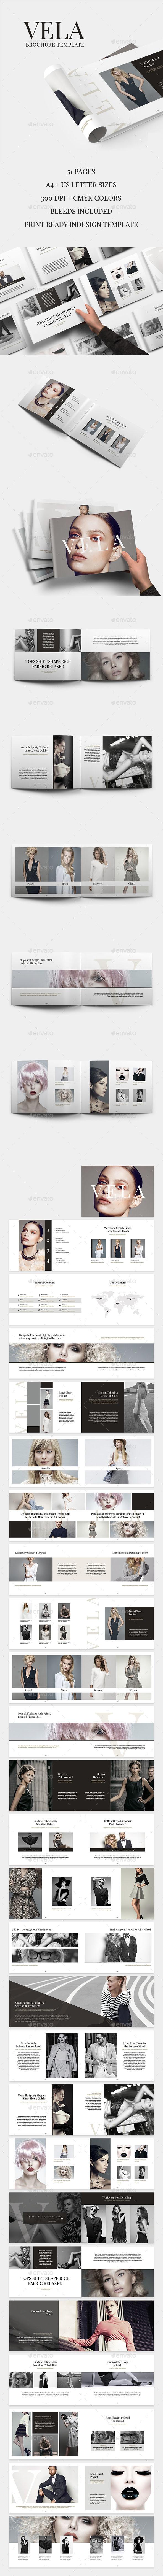 Vela Brochure Template - Catalogs Brochures